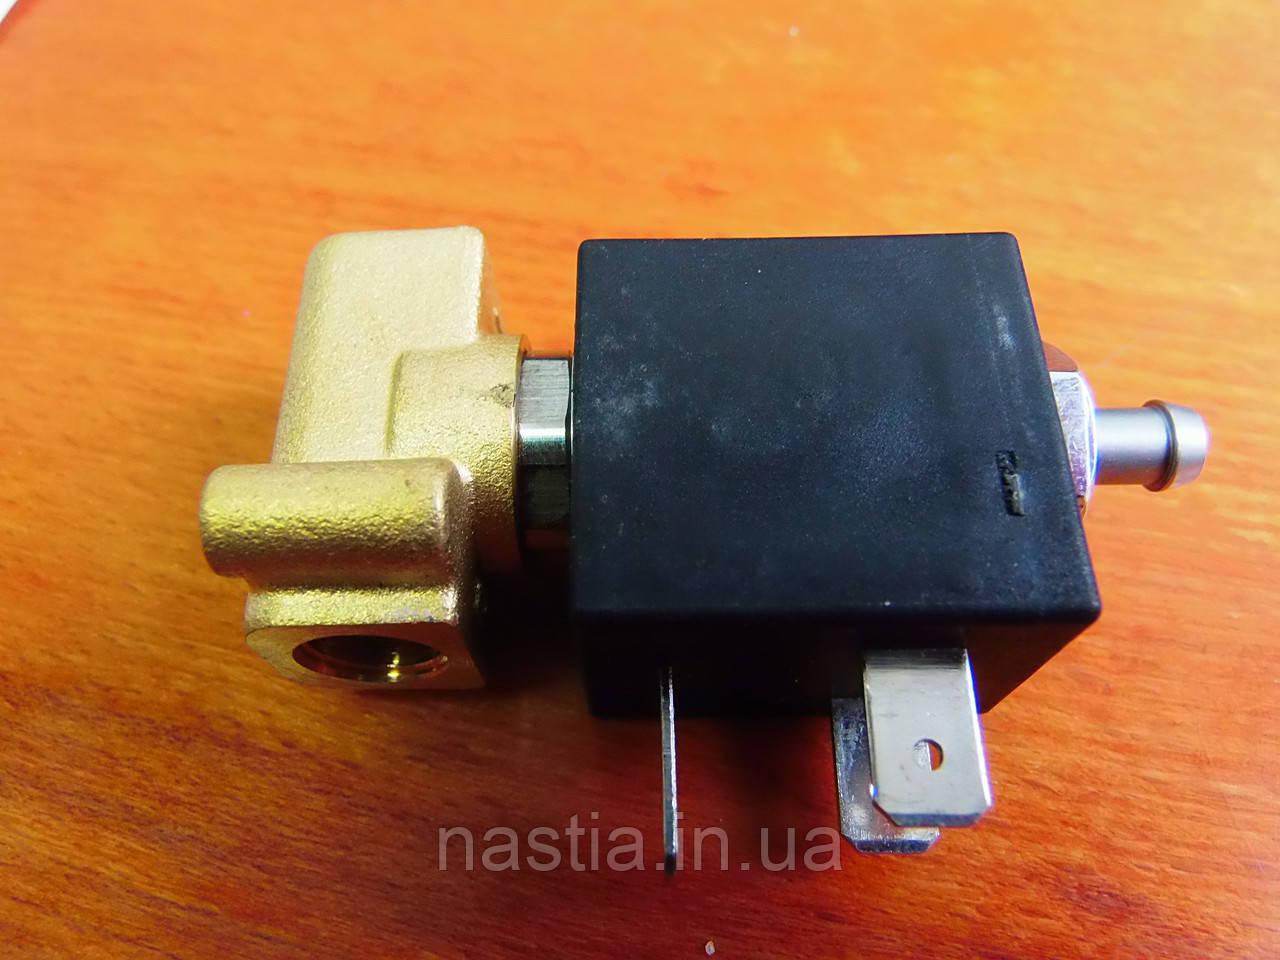 L206 (11023762) Електроклапан гарячої води, 24V, 20bar, 1/8-1/8, на 3 входи